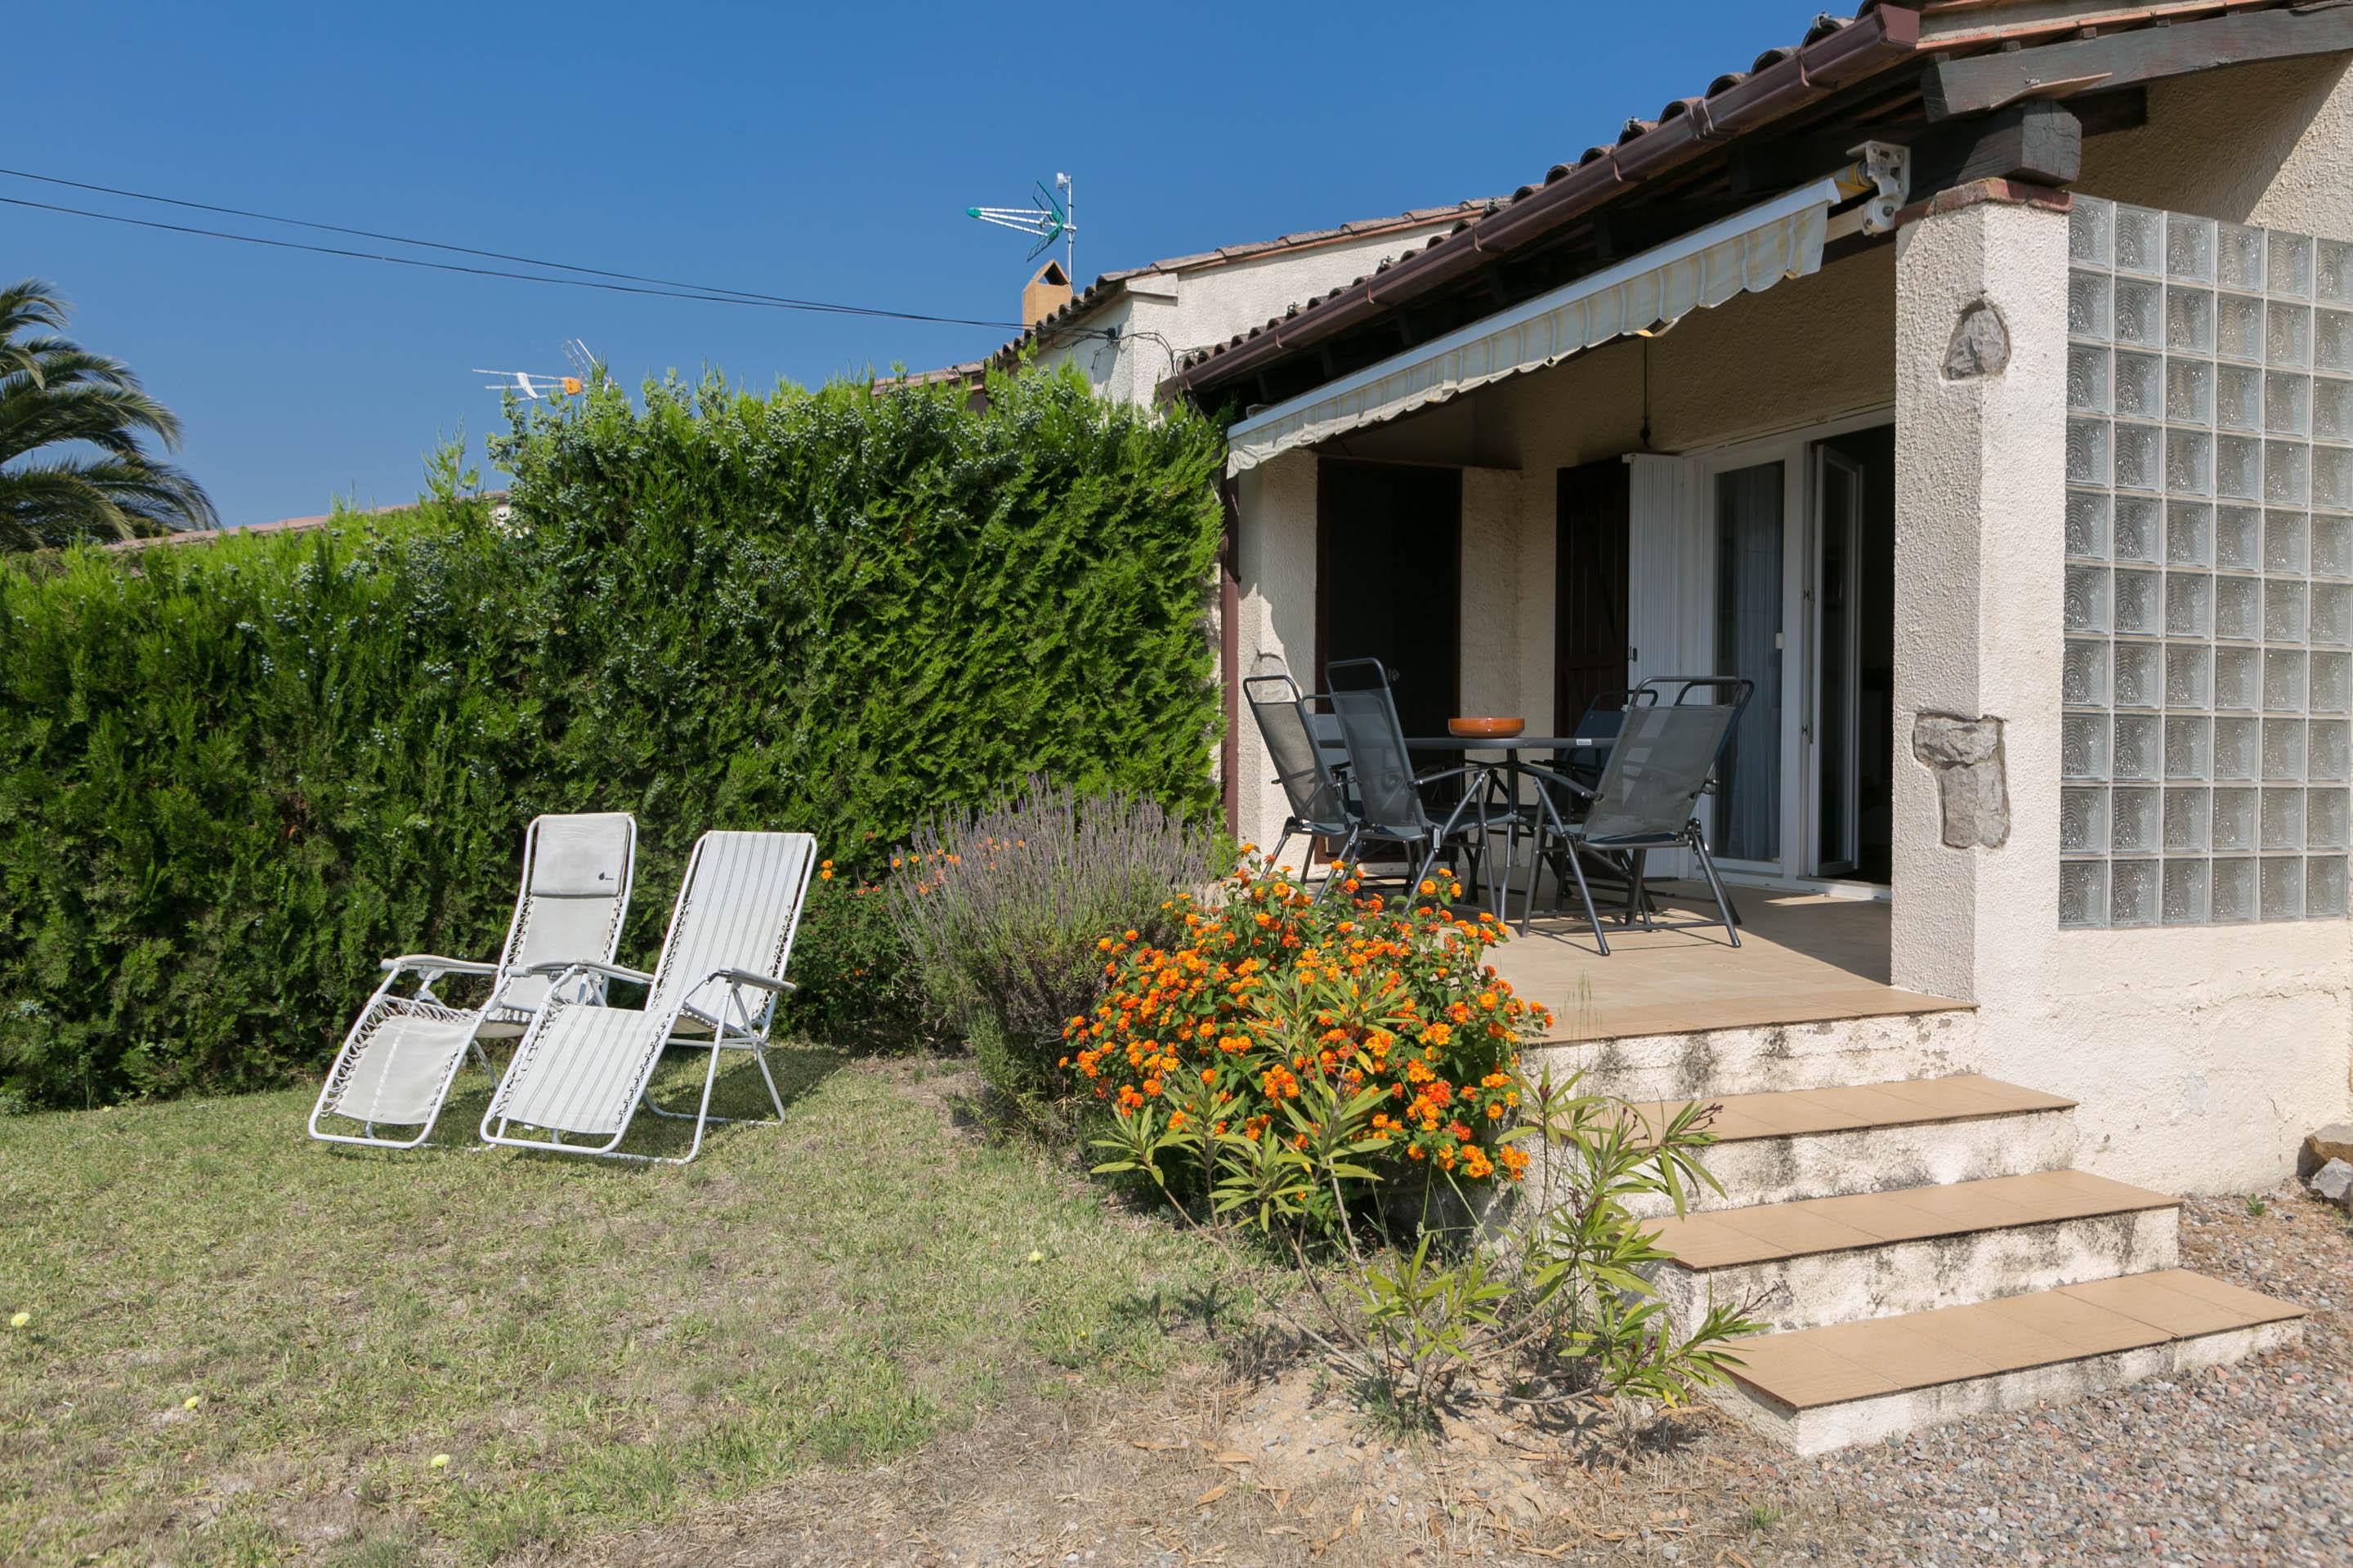 2 bedroom semi-detached house in Urb. Torre Gran, L'Estartit. Garden and community pool (Ref:H38) 3